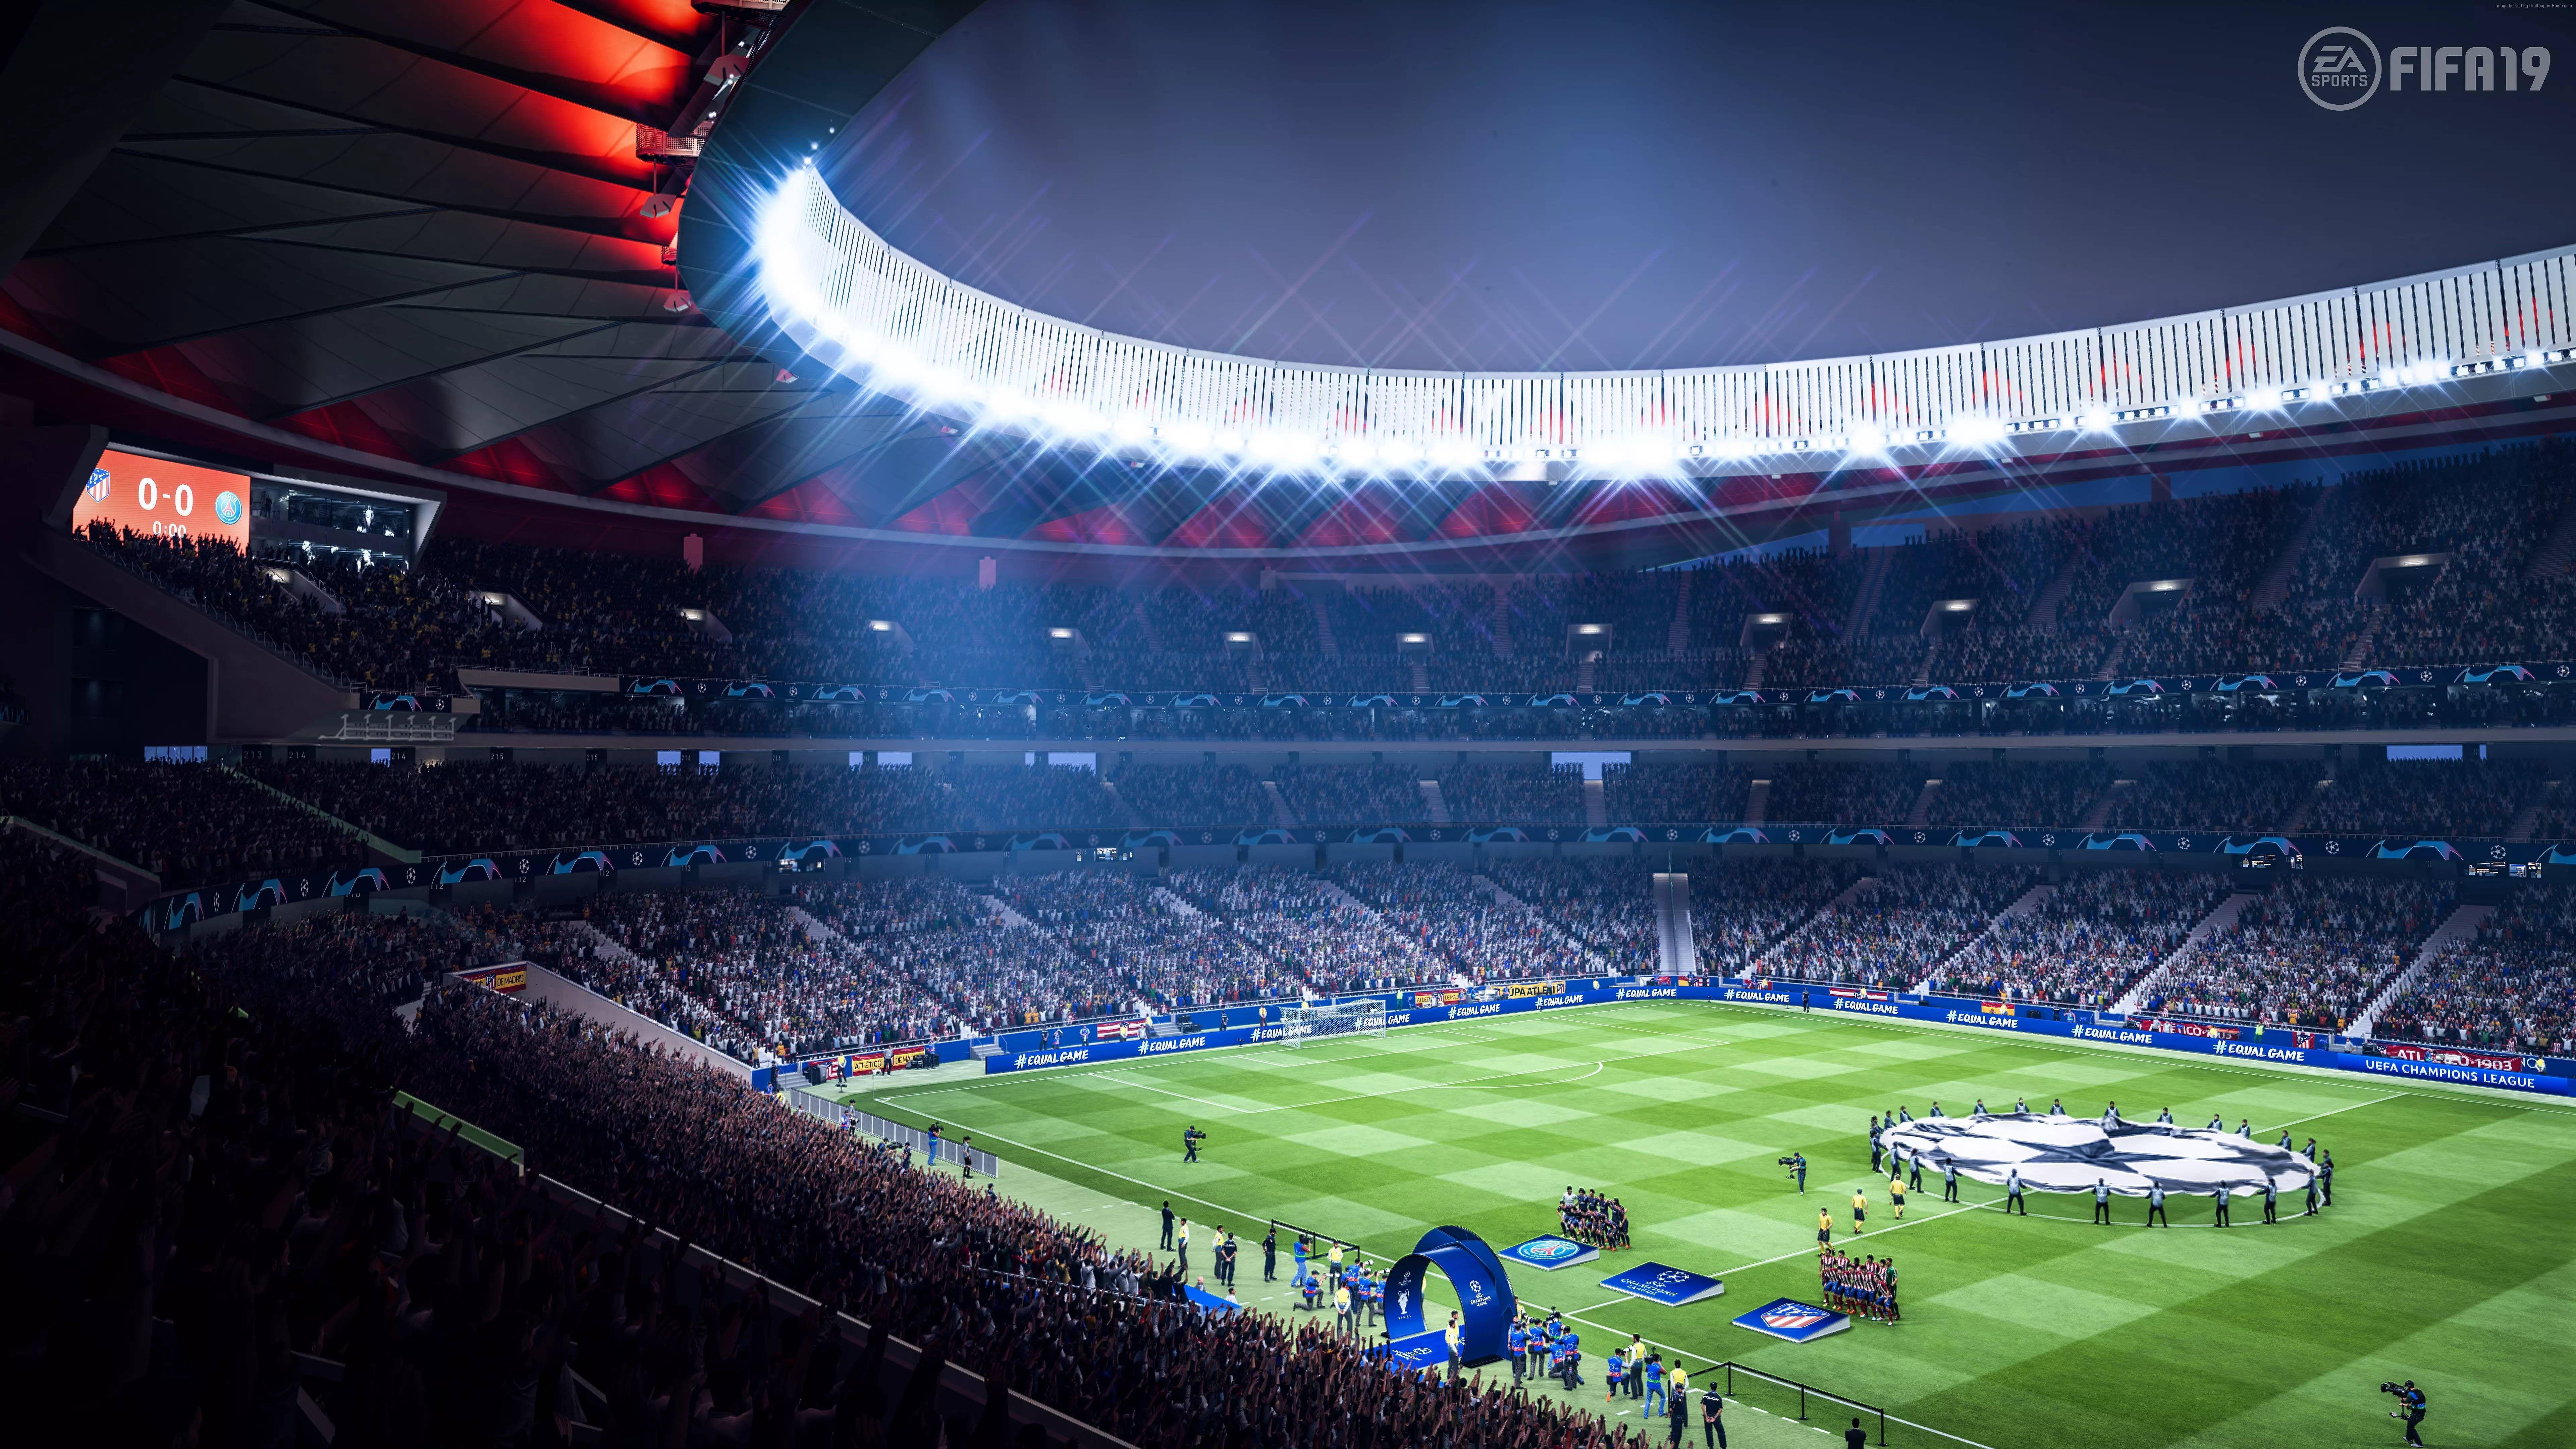 Fifa 19 Screenshot 8k E3 2018 8k Wallpaper Hdwallpaper Desktop Fifa Ps4 Or Xbox One Uefa Champions League